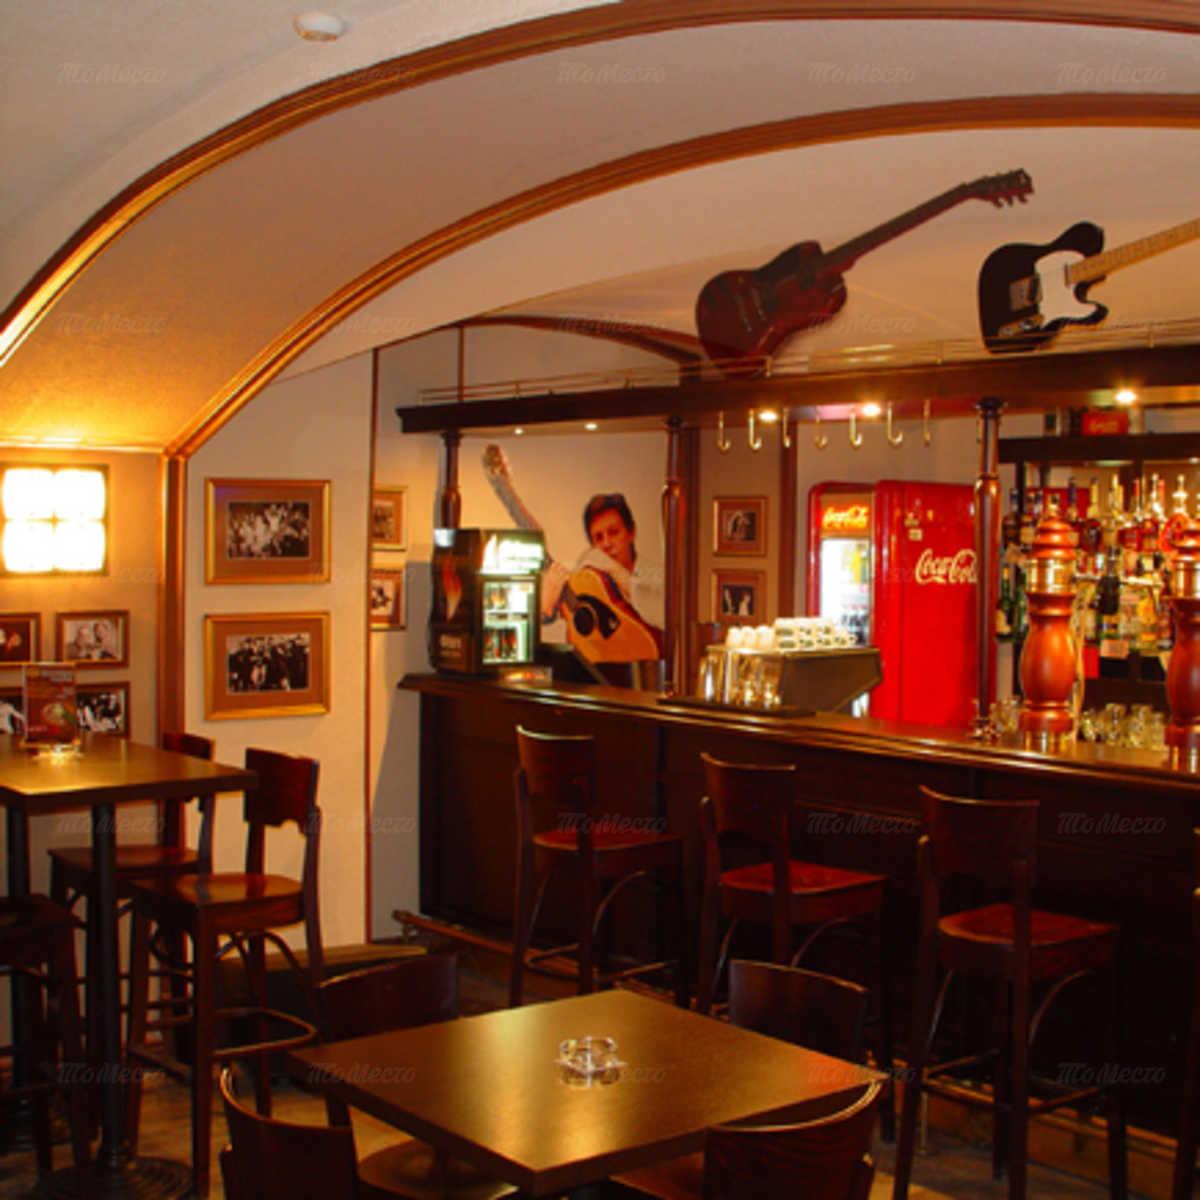 Паб Рок паб (Rock Pub) на Невском проспекте фото 8